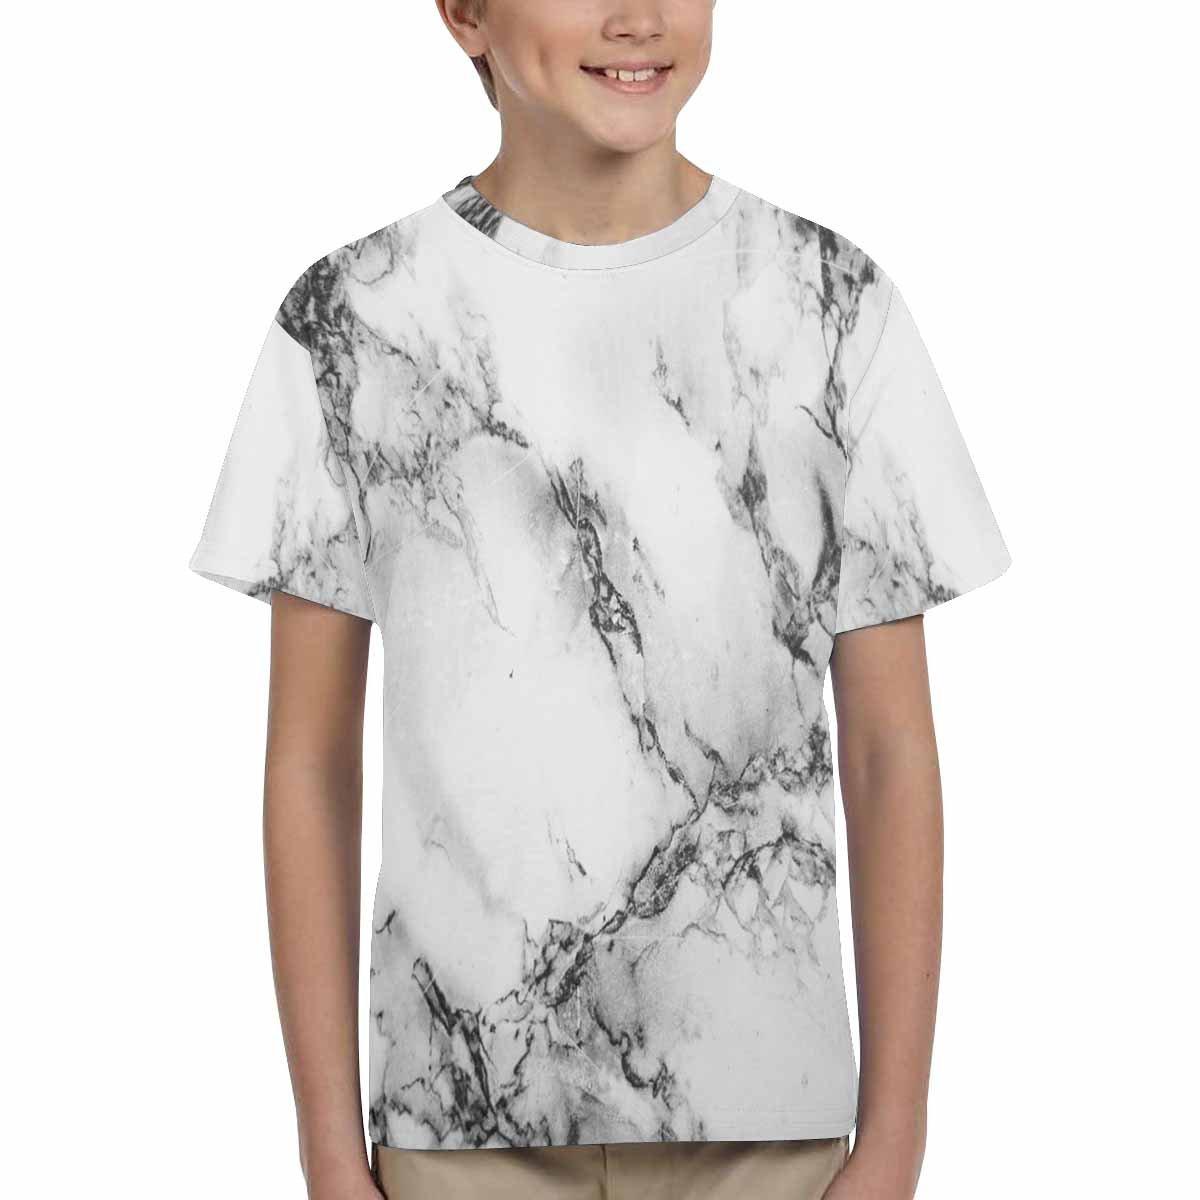 XS-XL INTERESTPRINT Youth Crew Neck T-Shirt Marble Pattern